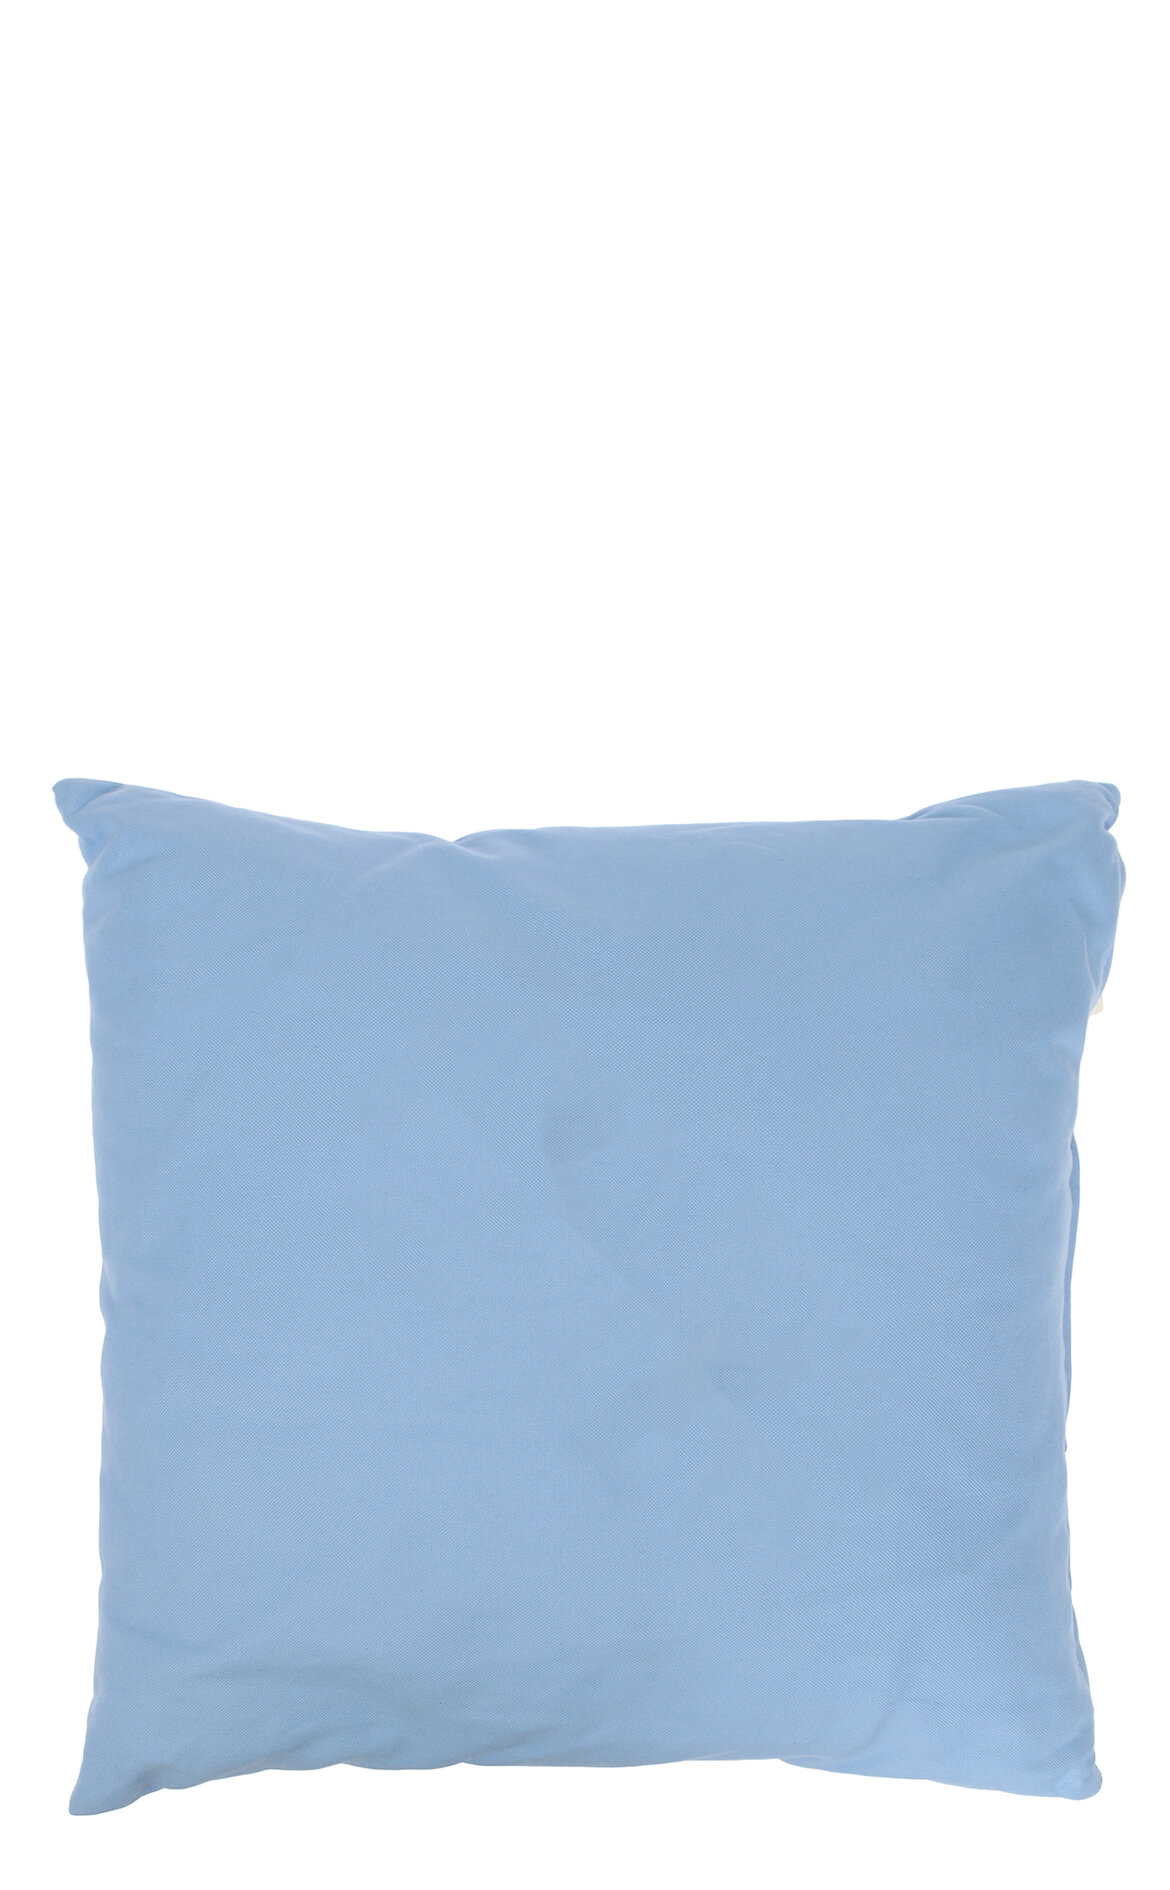 Laura Ashley-Laura Ashley Wvn Holden Denim 45X45 cm Dekoratif Yastık